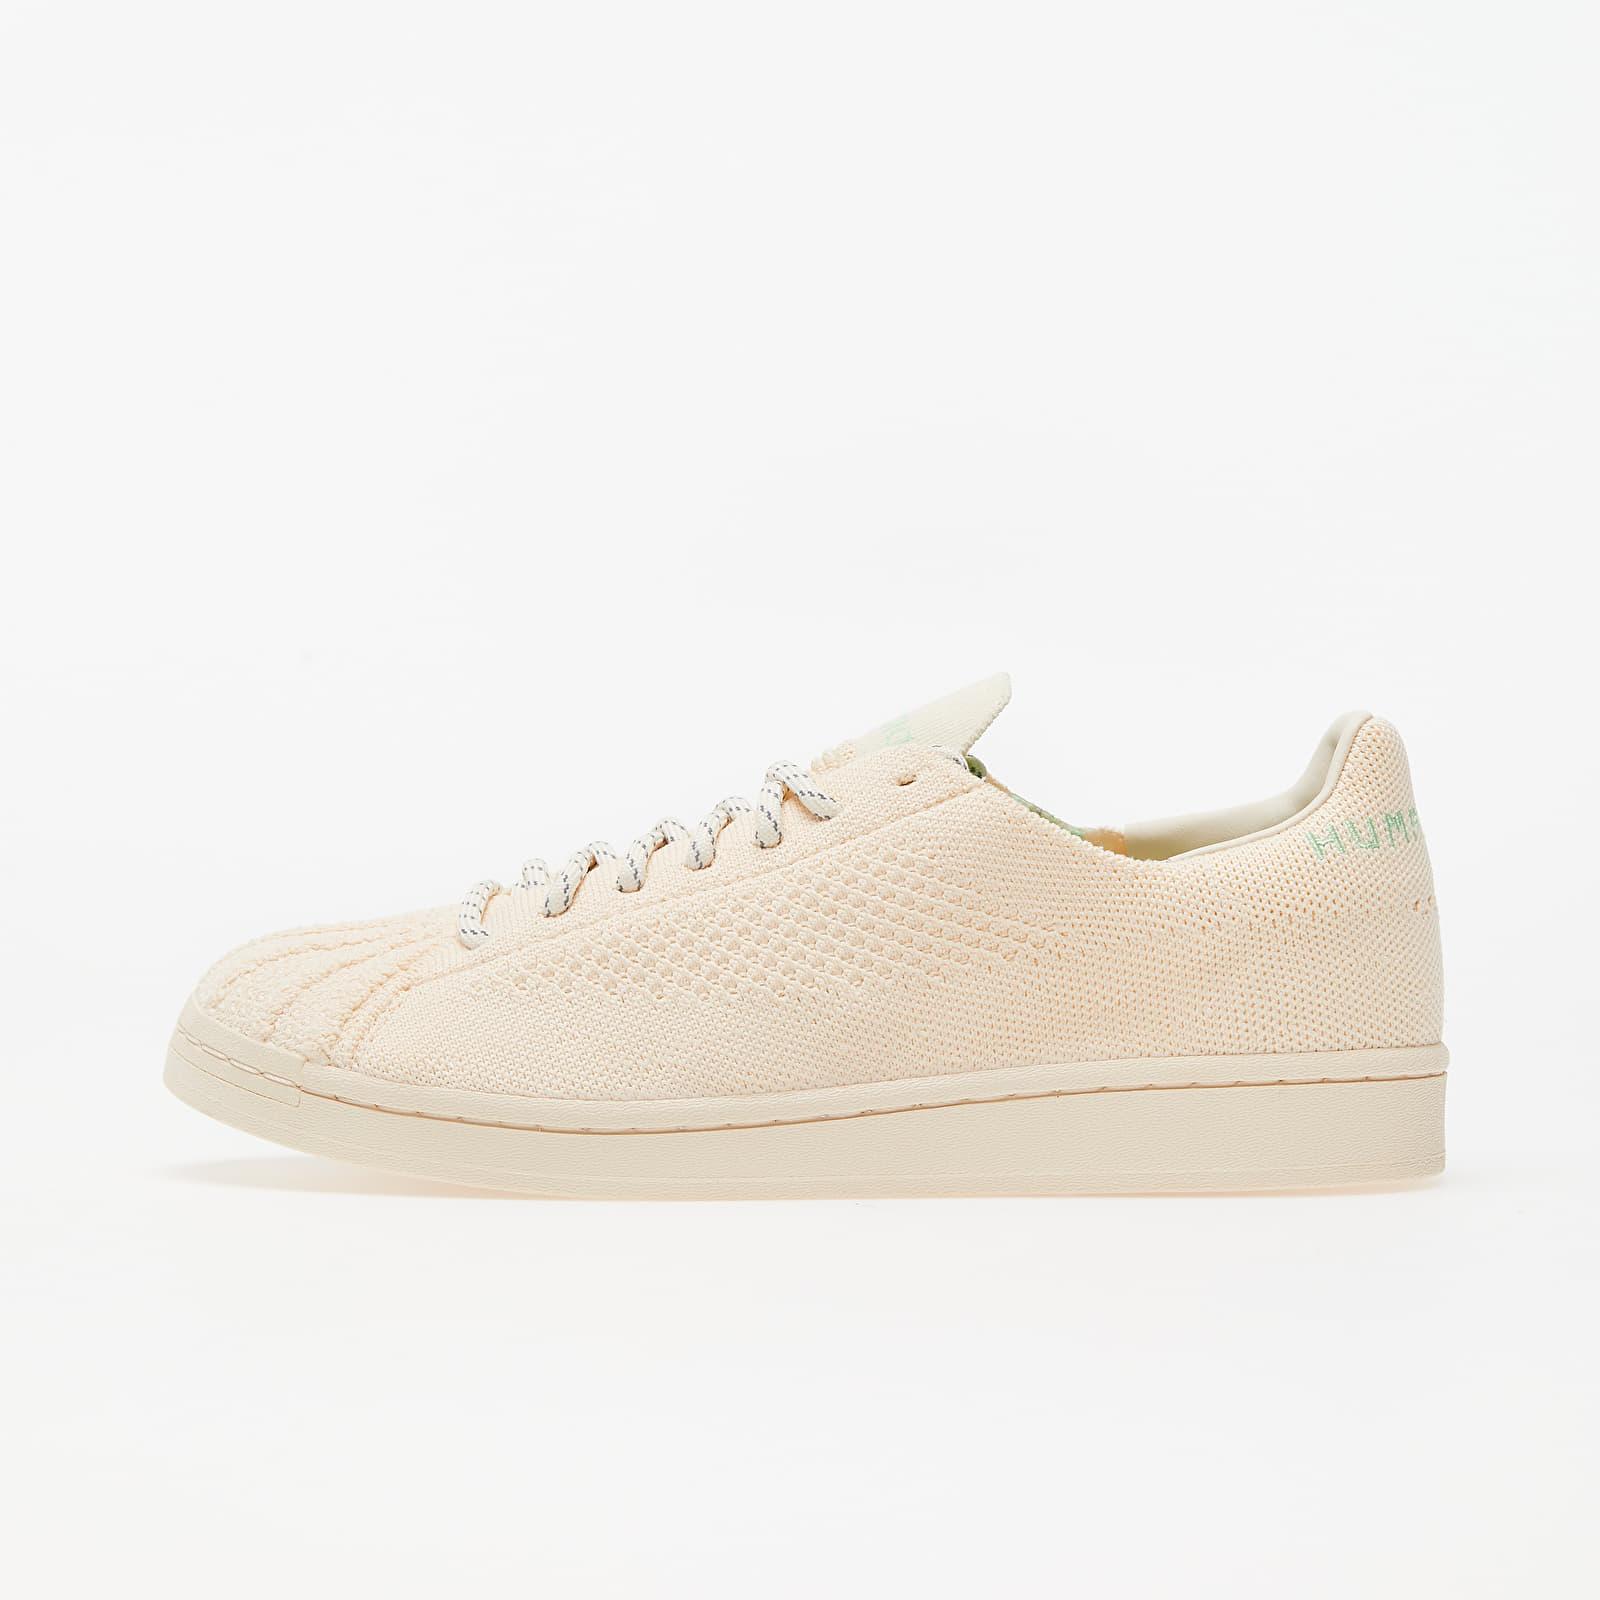 adidas x Pharrell Williams Superstar Pk Ecru Tint/ Core White/ Glow Mint EUR 44